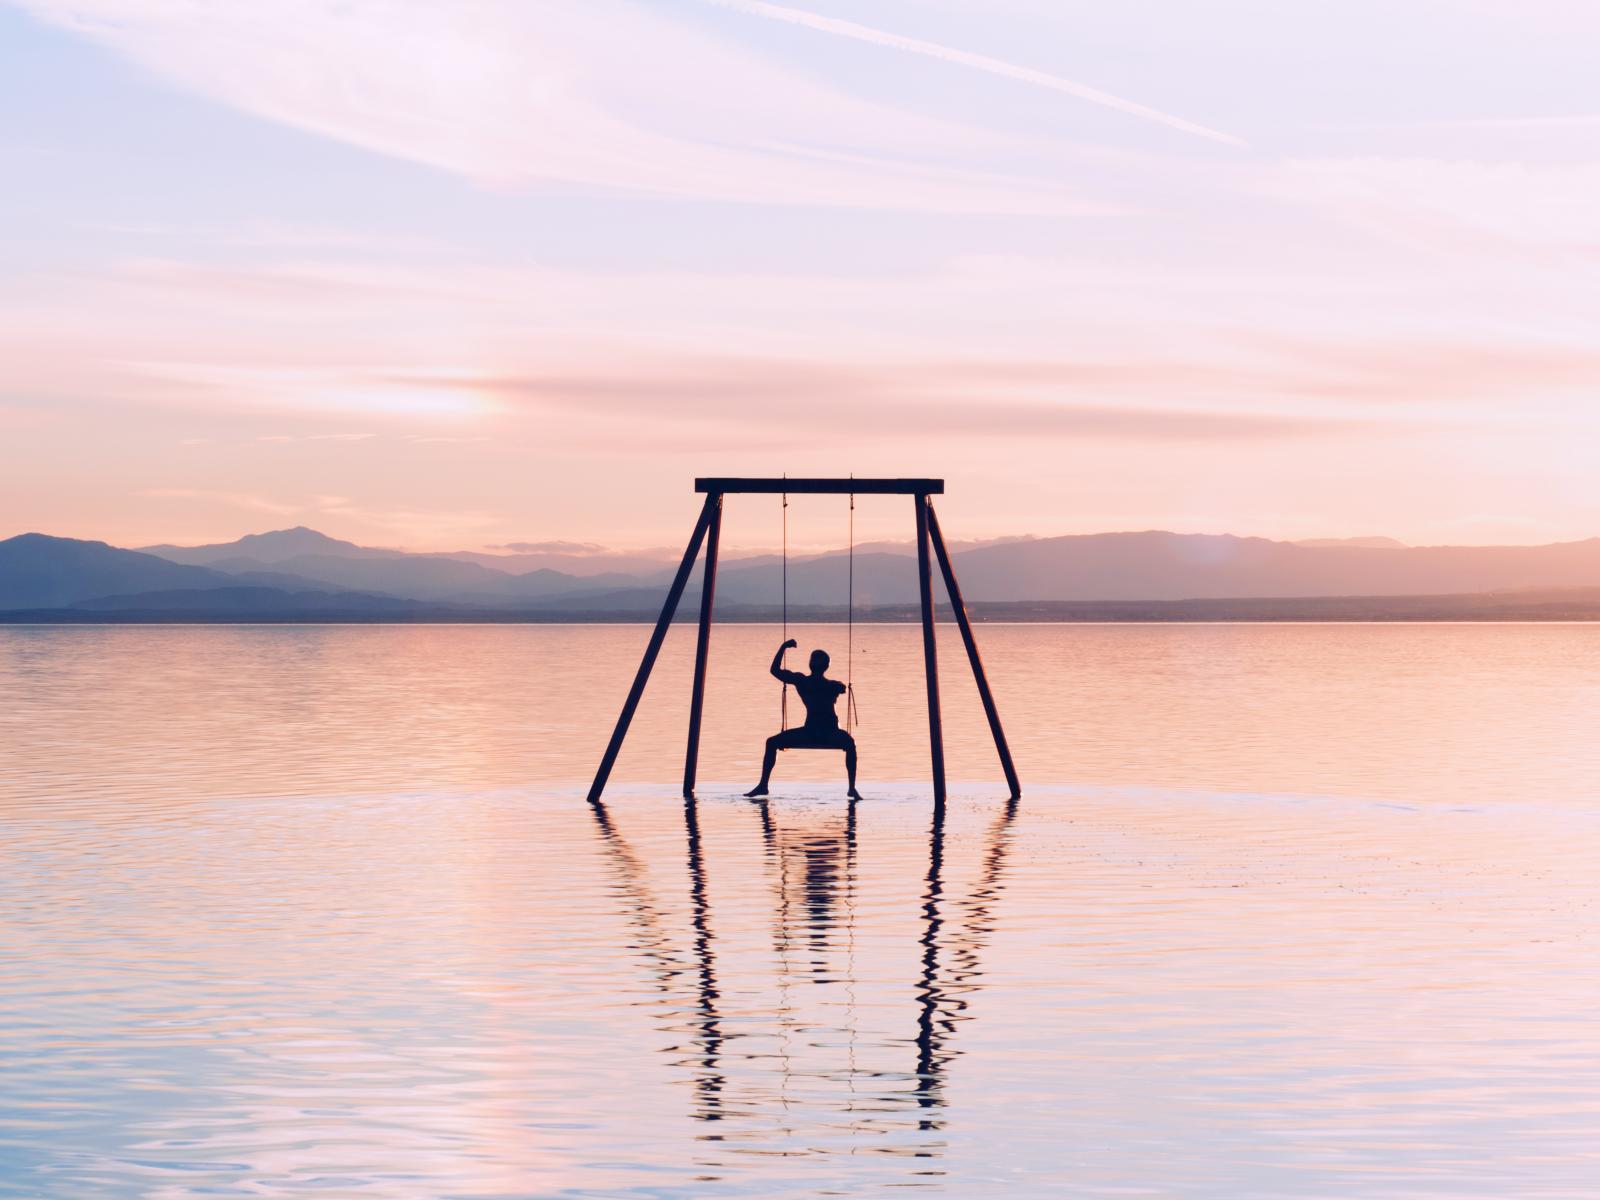 Photography image - Loading 8.-Attendee-on-swing-on-Salton-Sea.jpg